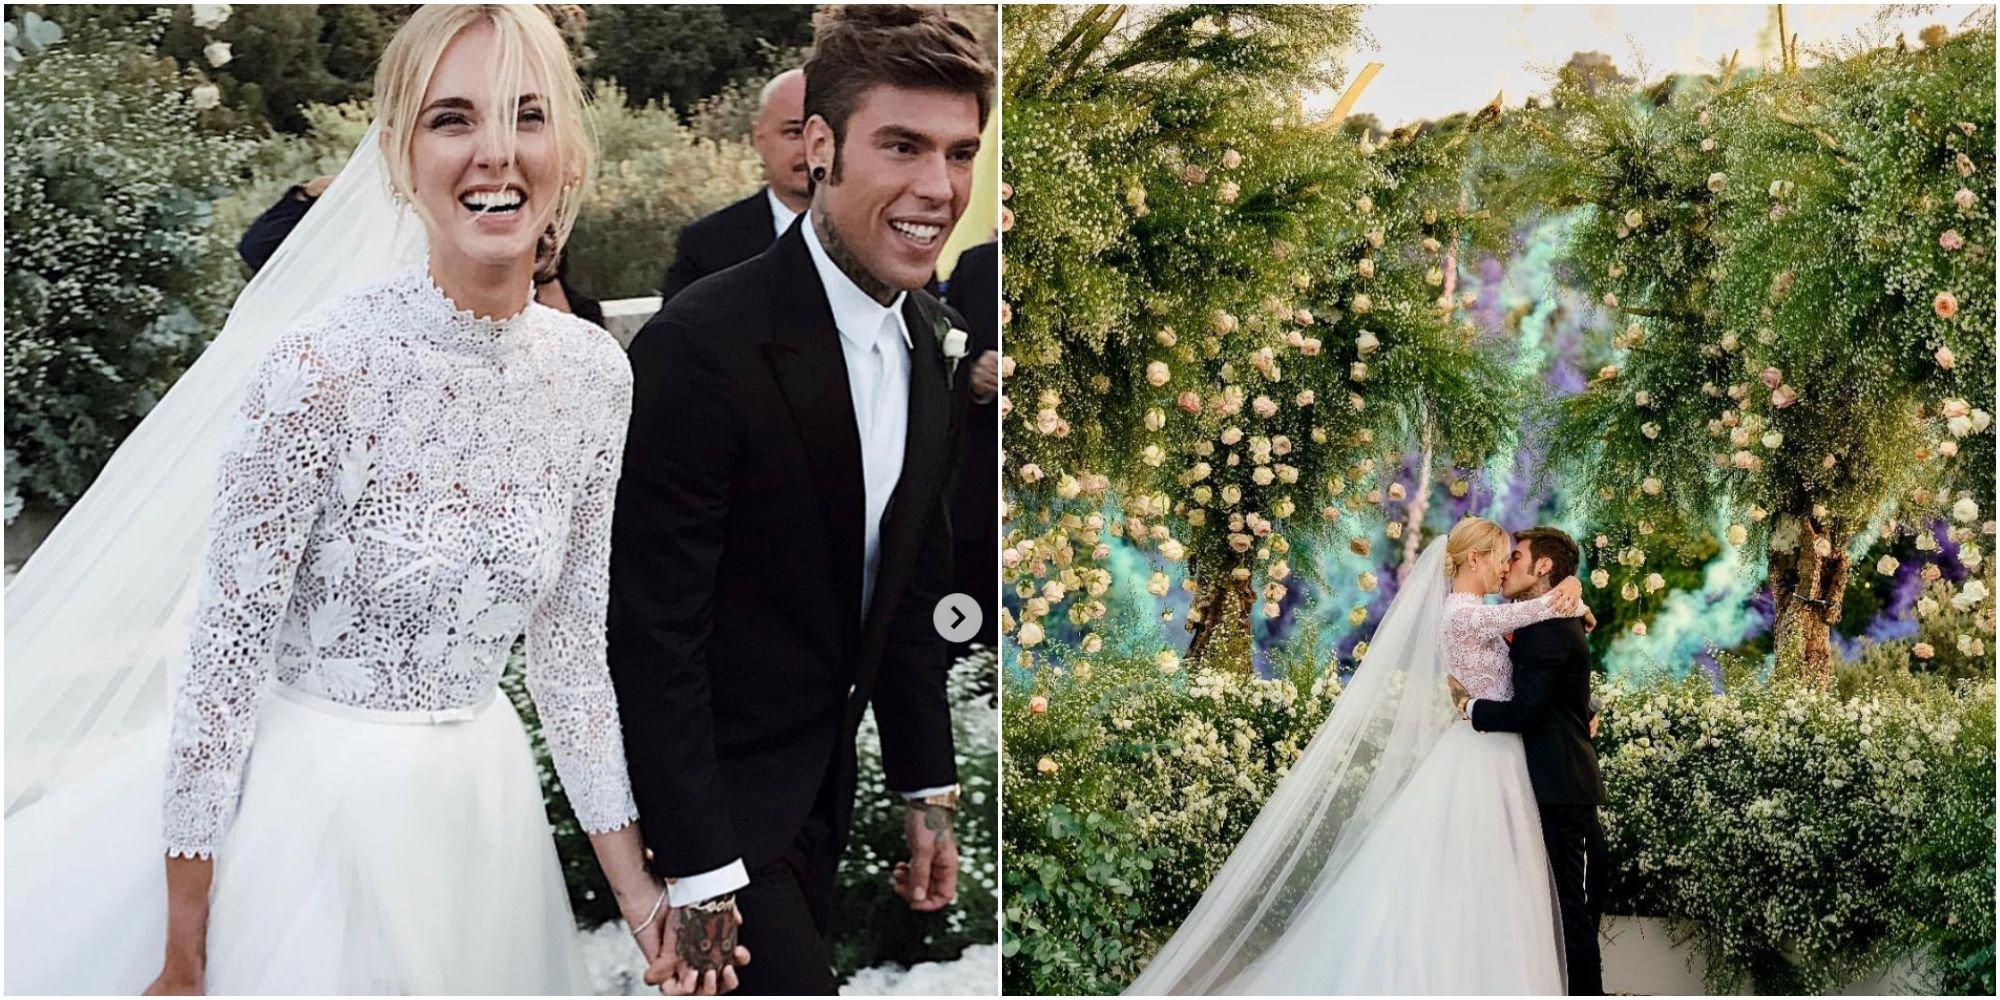 img 5b8d93ad5c5f5.png?resize=300,169 - 人氣部落客Chiara Ferragni夢幻婚禮比皇室還誇張!訂製婚紗、專機載客竟然還建摩天輪!